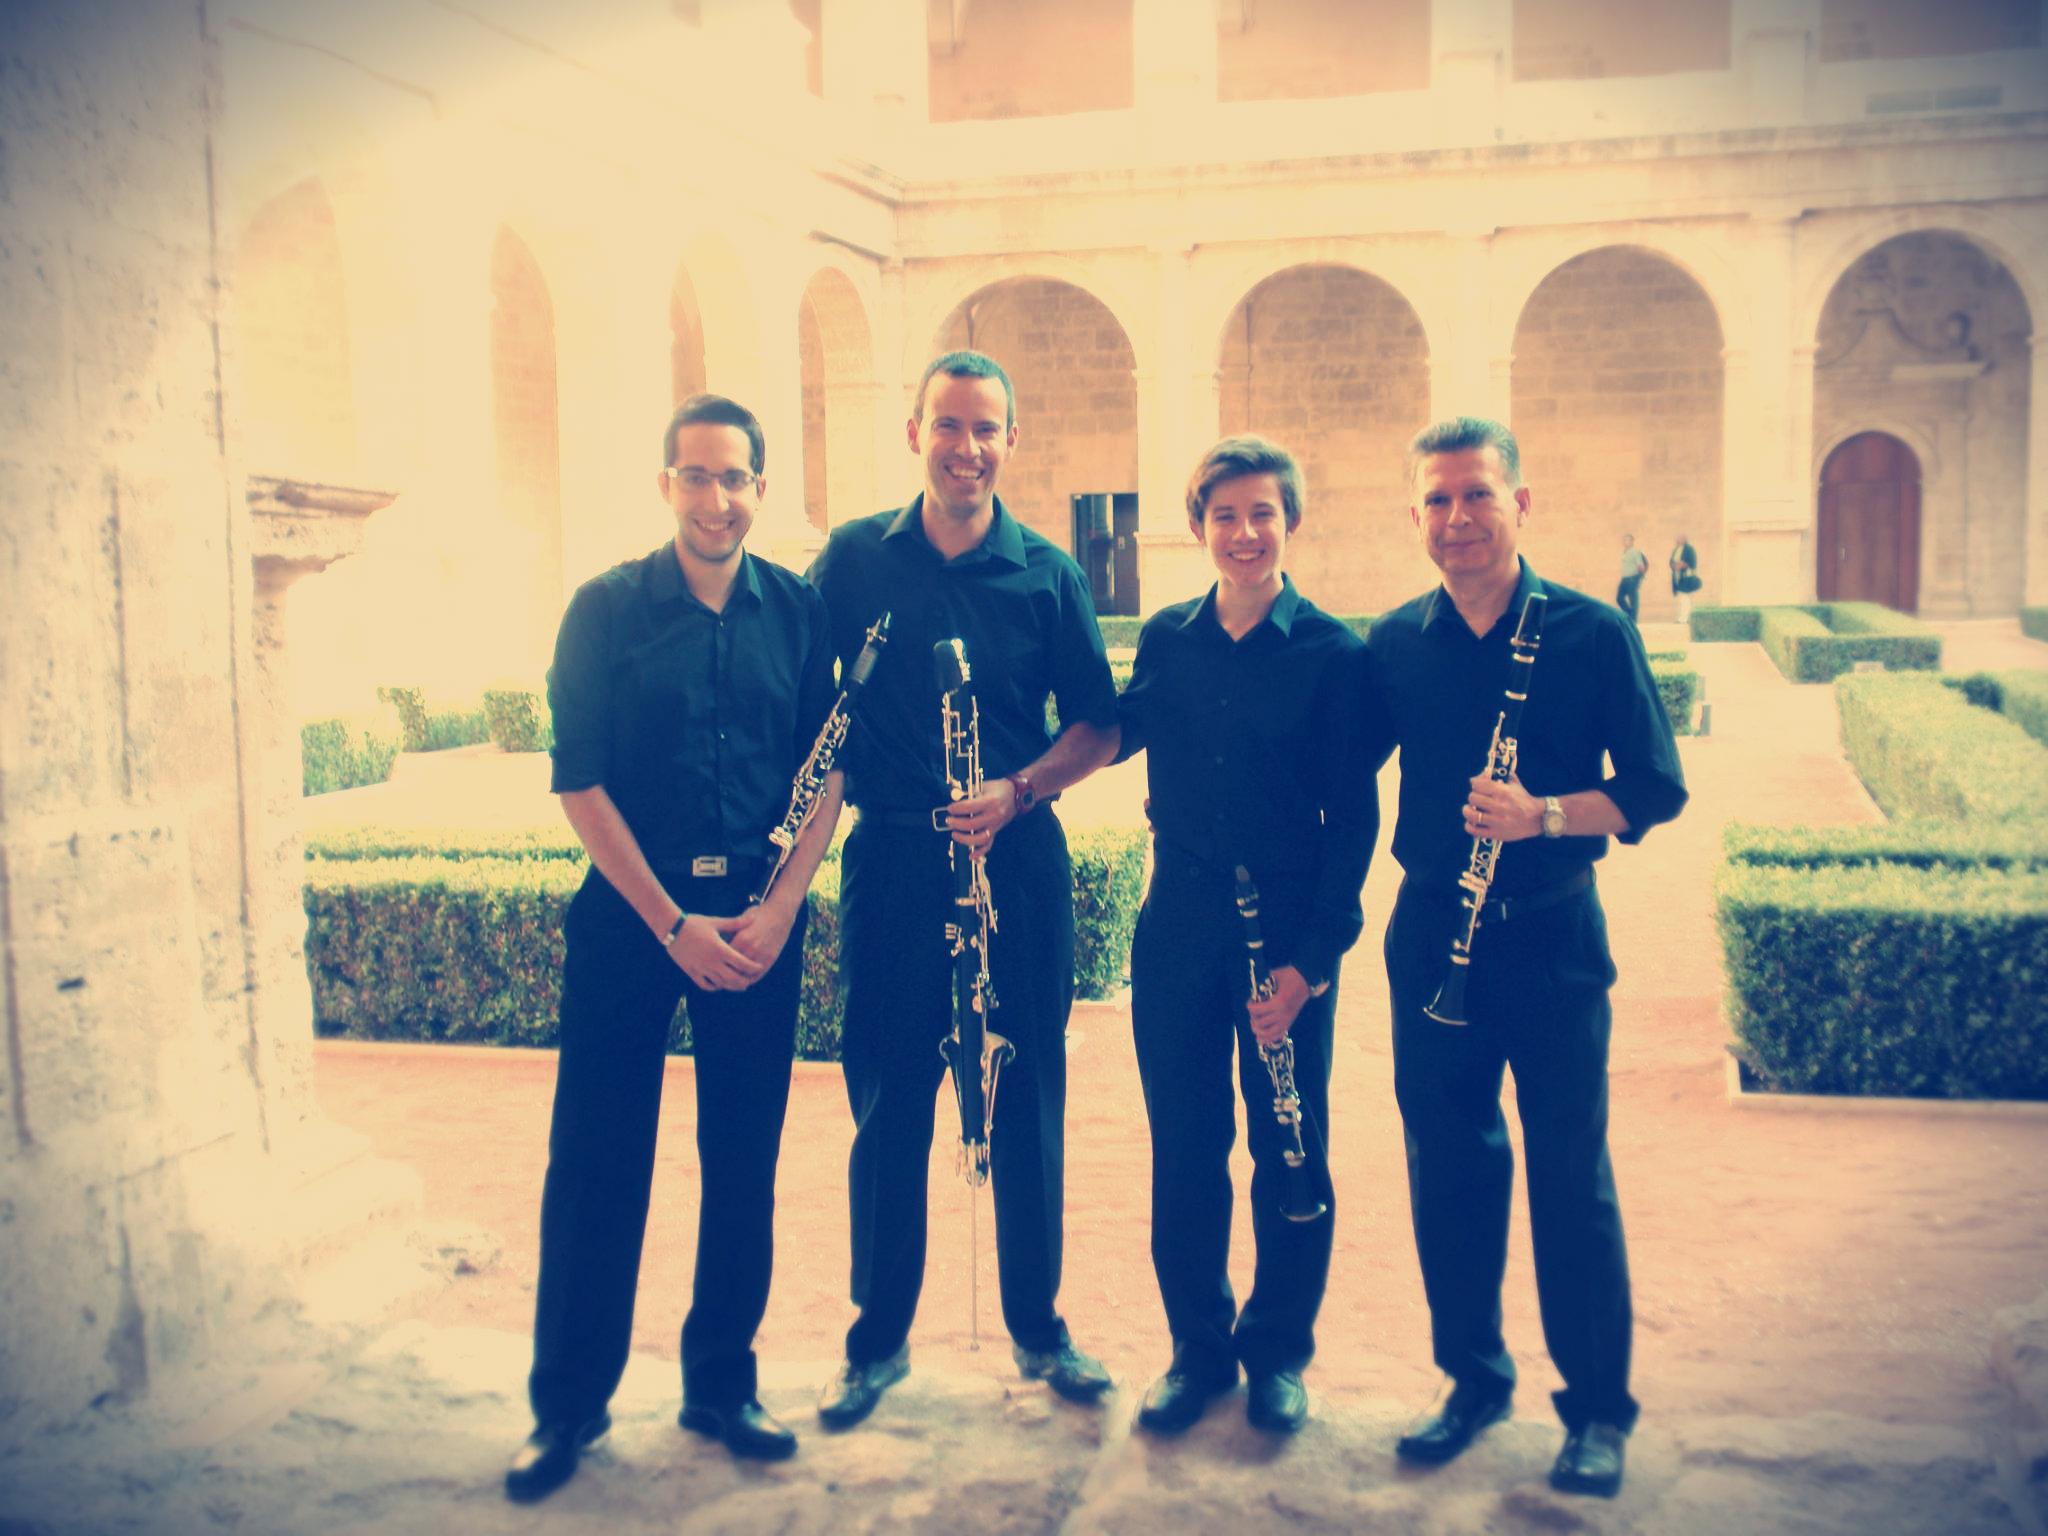 Blackwood Clarinet